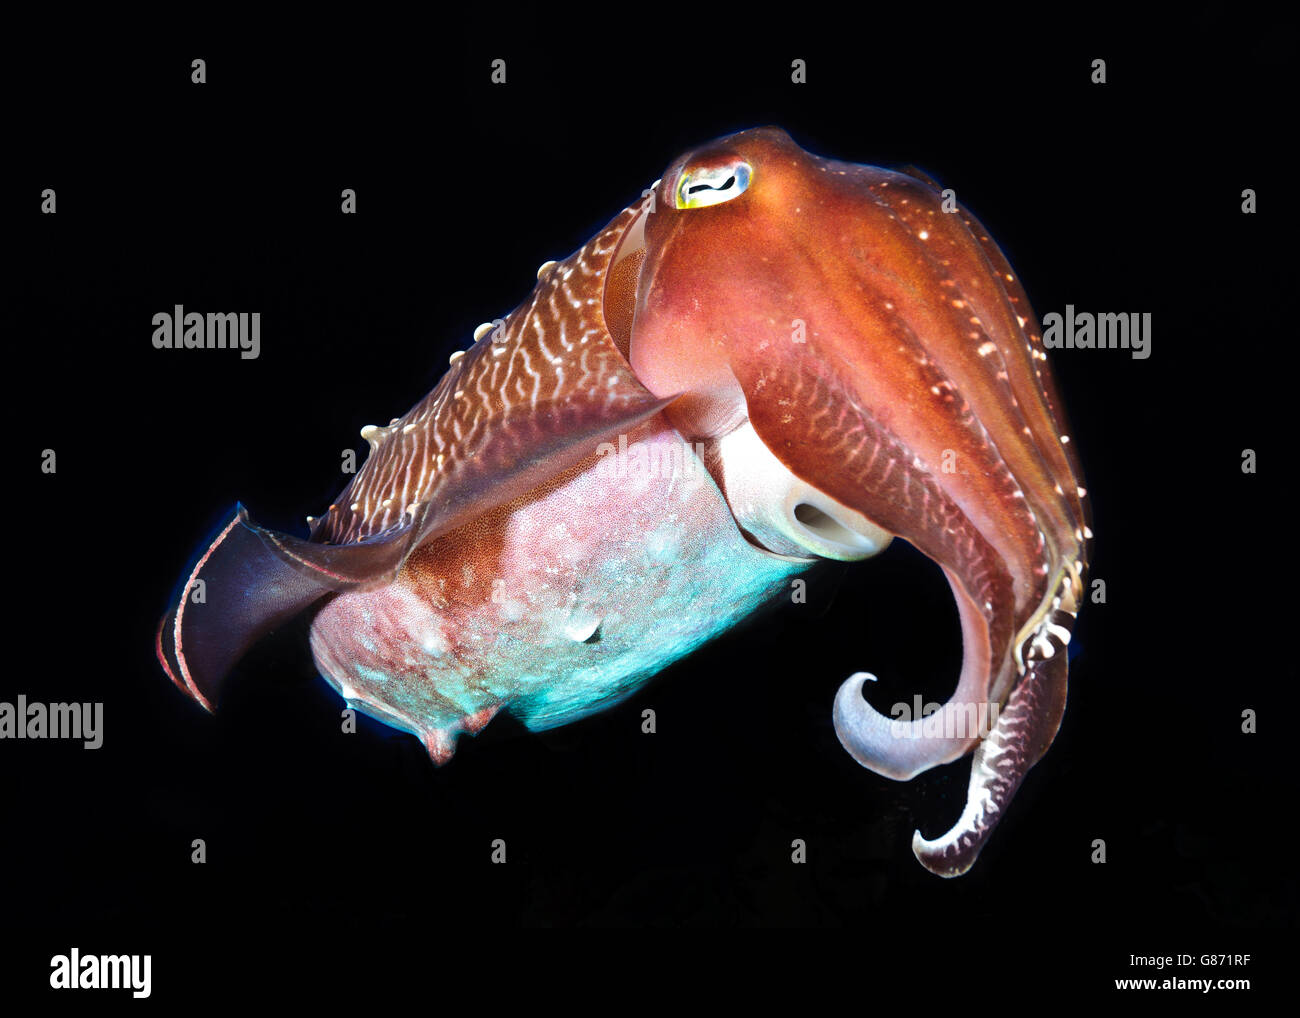 Animal portrait of a pharaoh cuttlefish, Sorong, West Papua, Indonesia - Stock Image